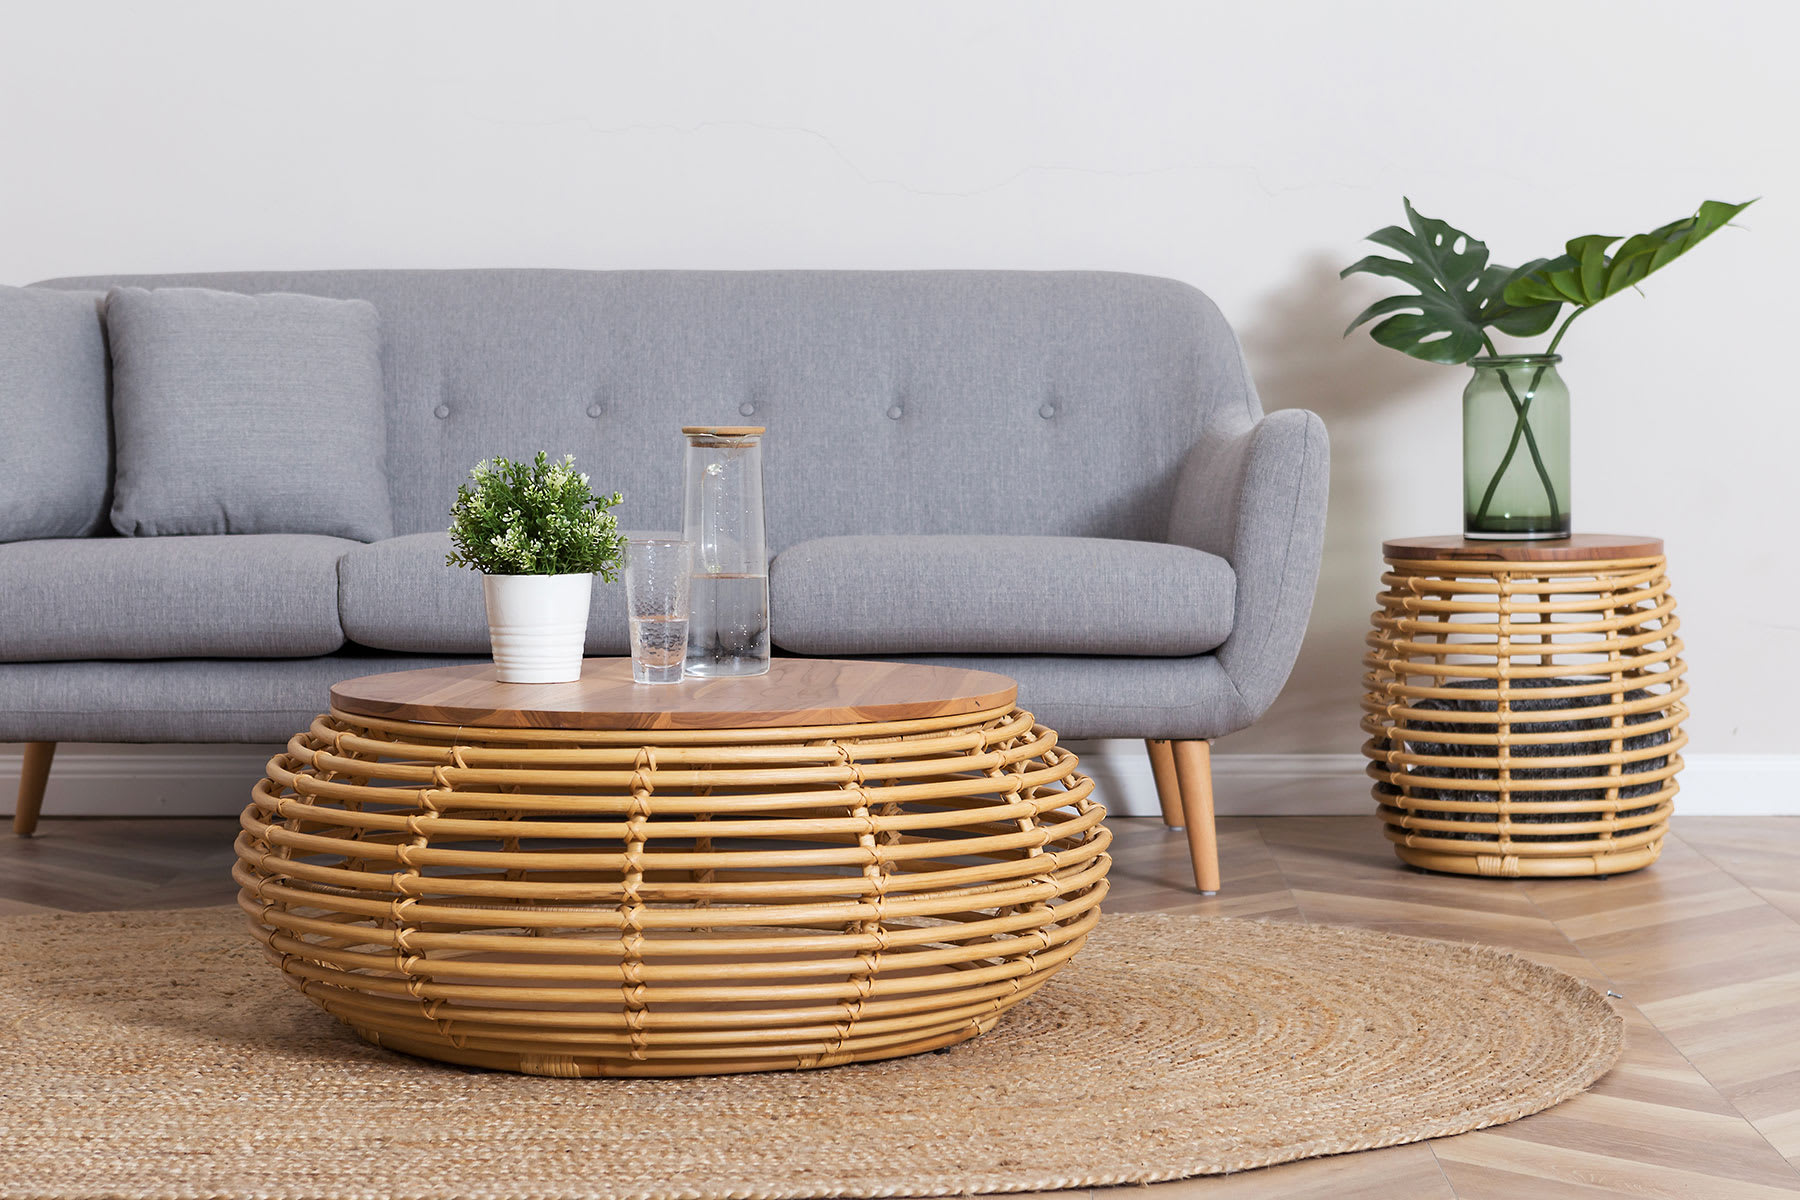 boho tropical chic living room furniture with scandinavian sofa, rattan and teak coffee table and jute rug